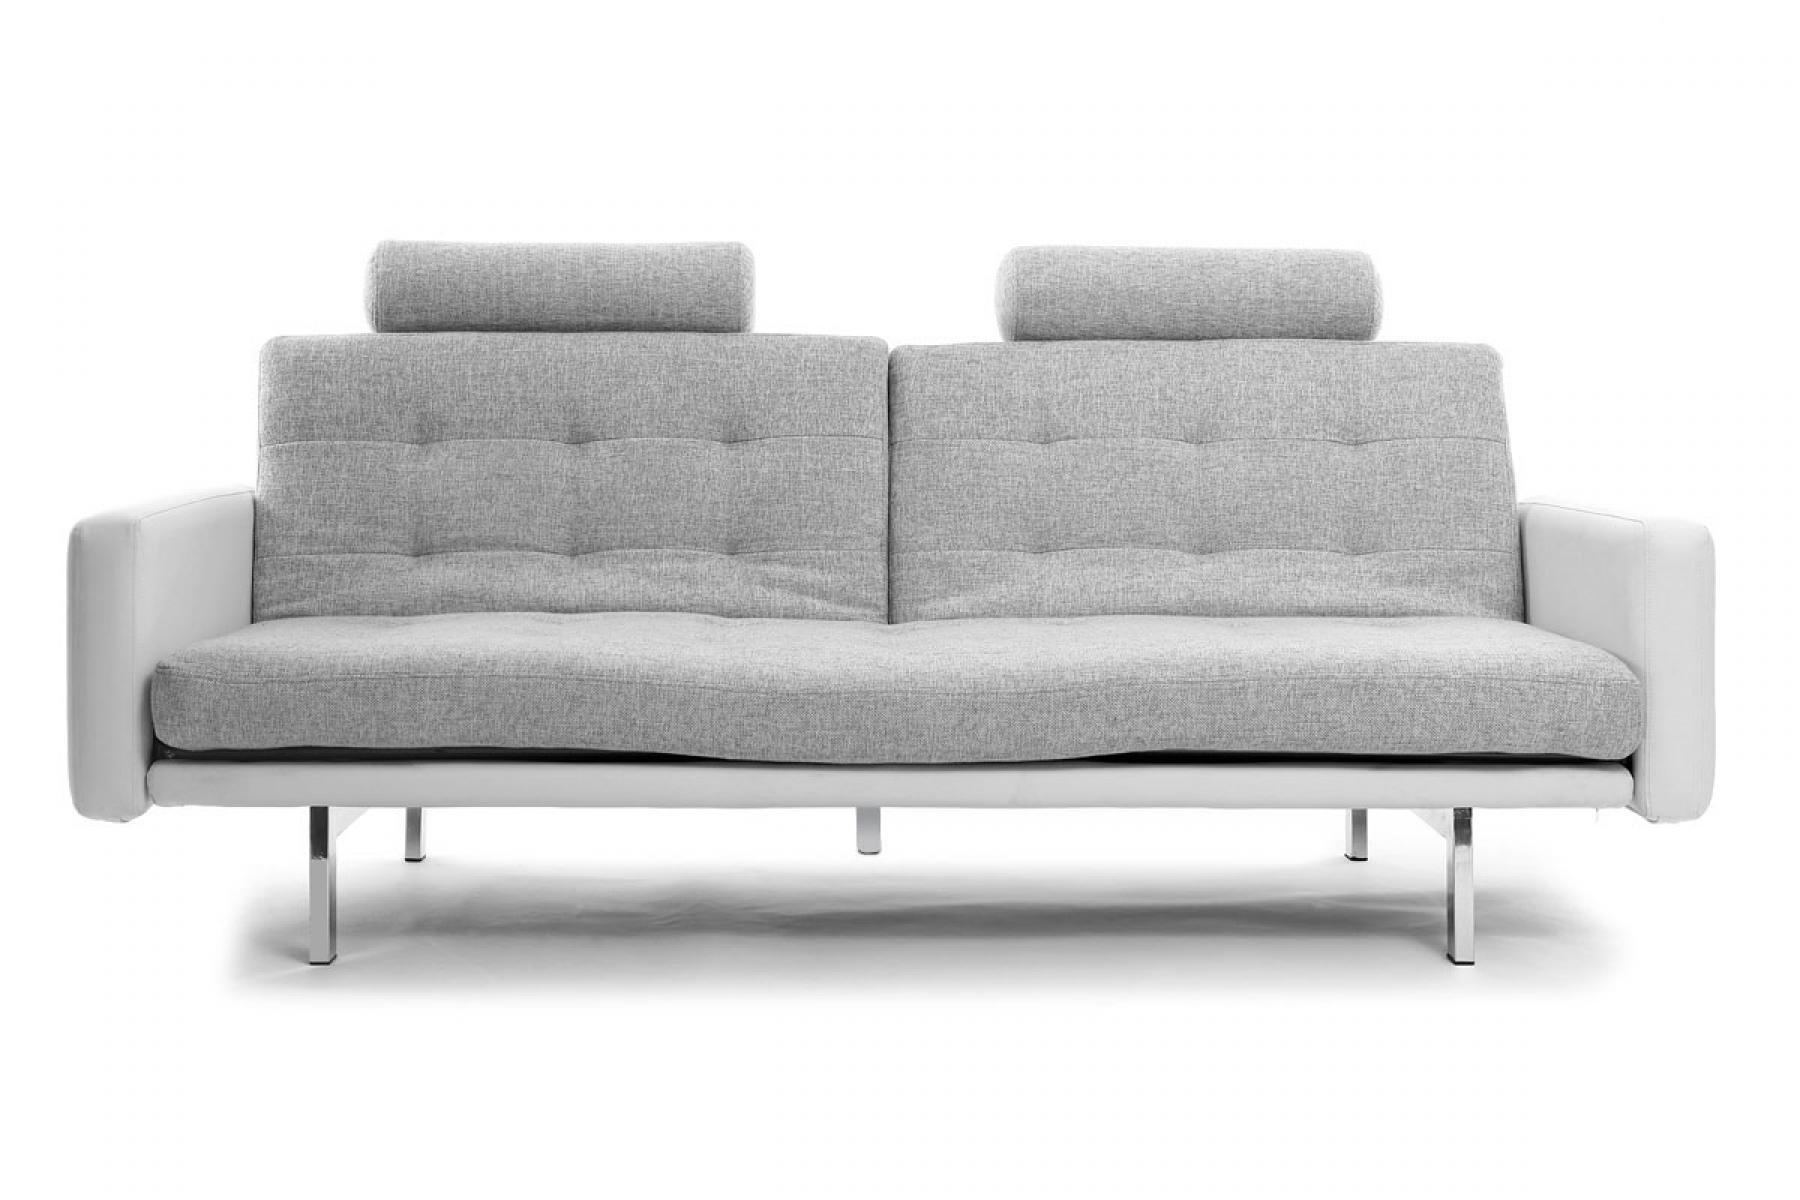 photos canap convertible 3 places design. Black Bedroom Furniture Sets. Home Design Ideas